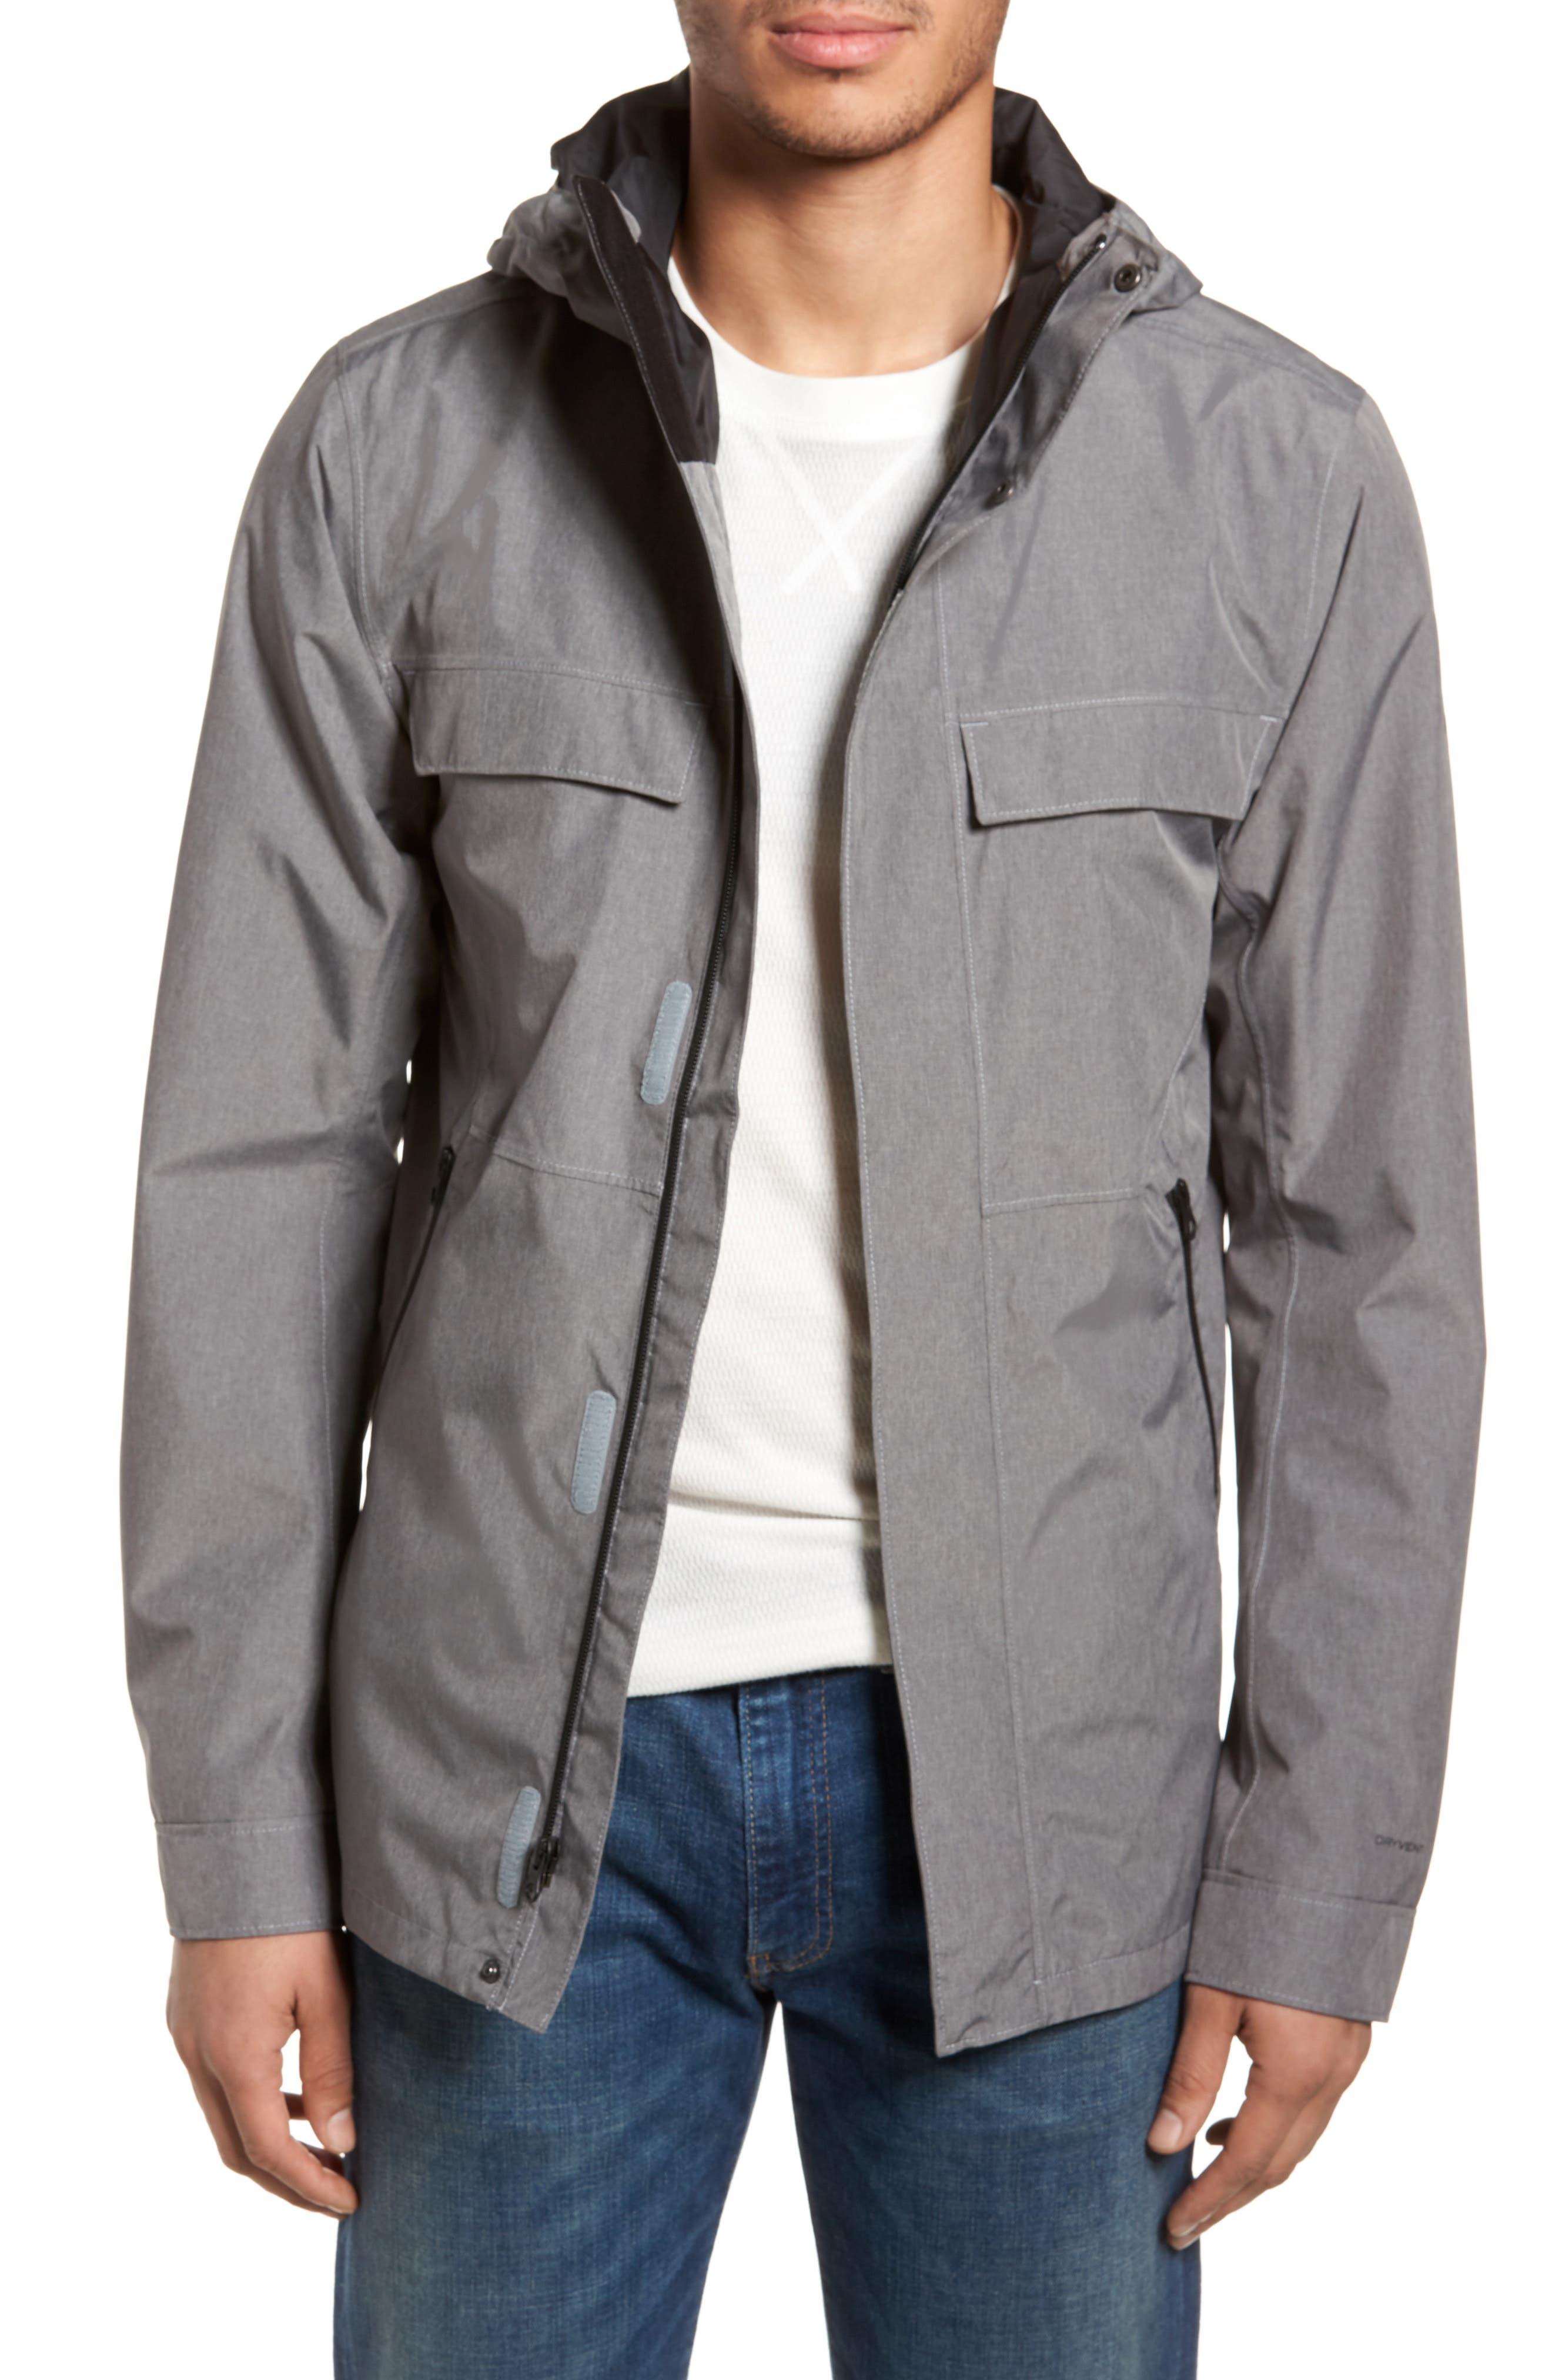 Jenison II Insulated Waterproof Jacket,                             Main thumbnail 1, color,                             TNF MEDIUM GREY HEATHER